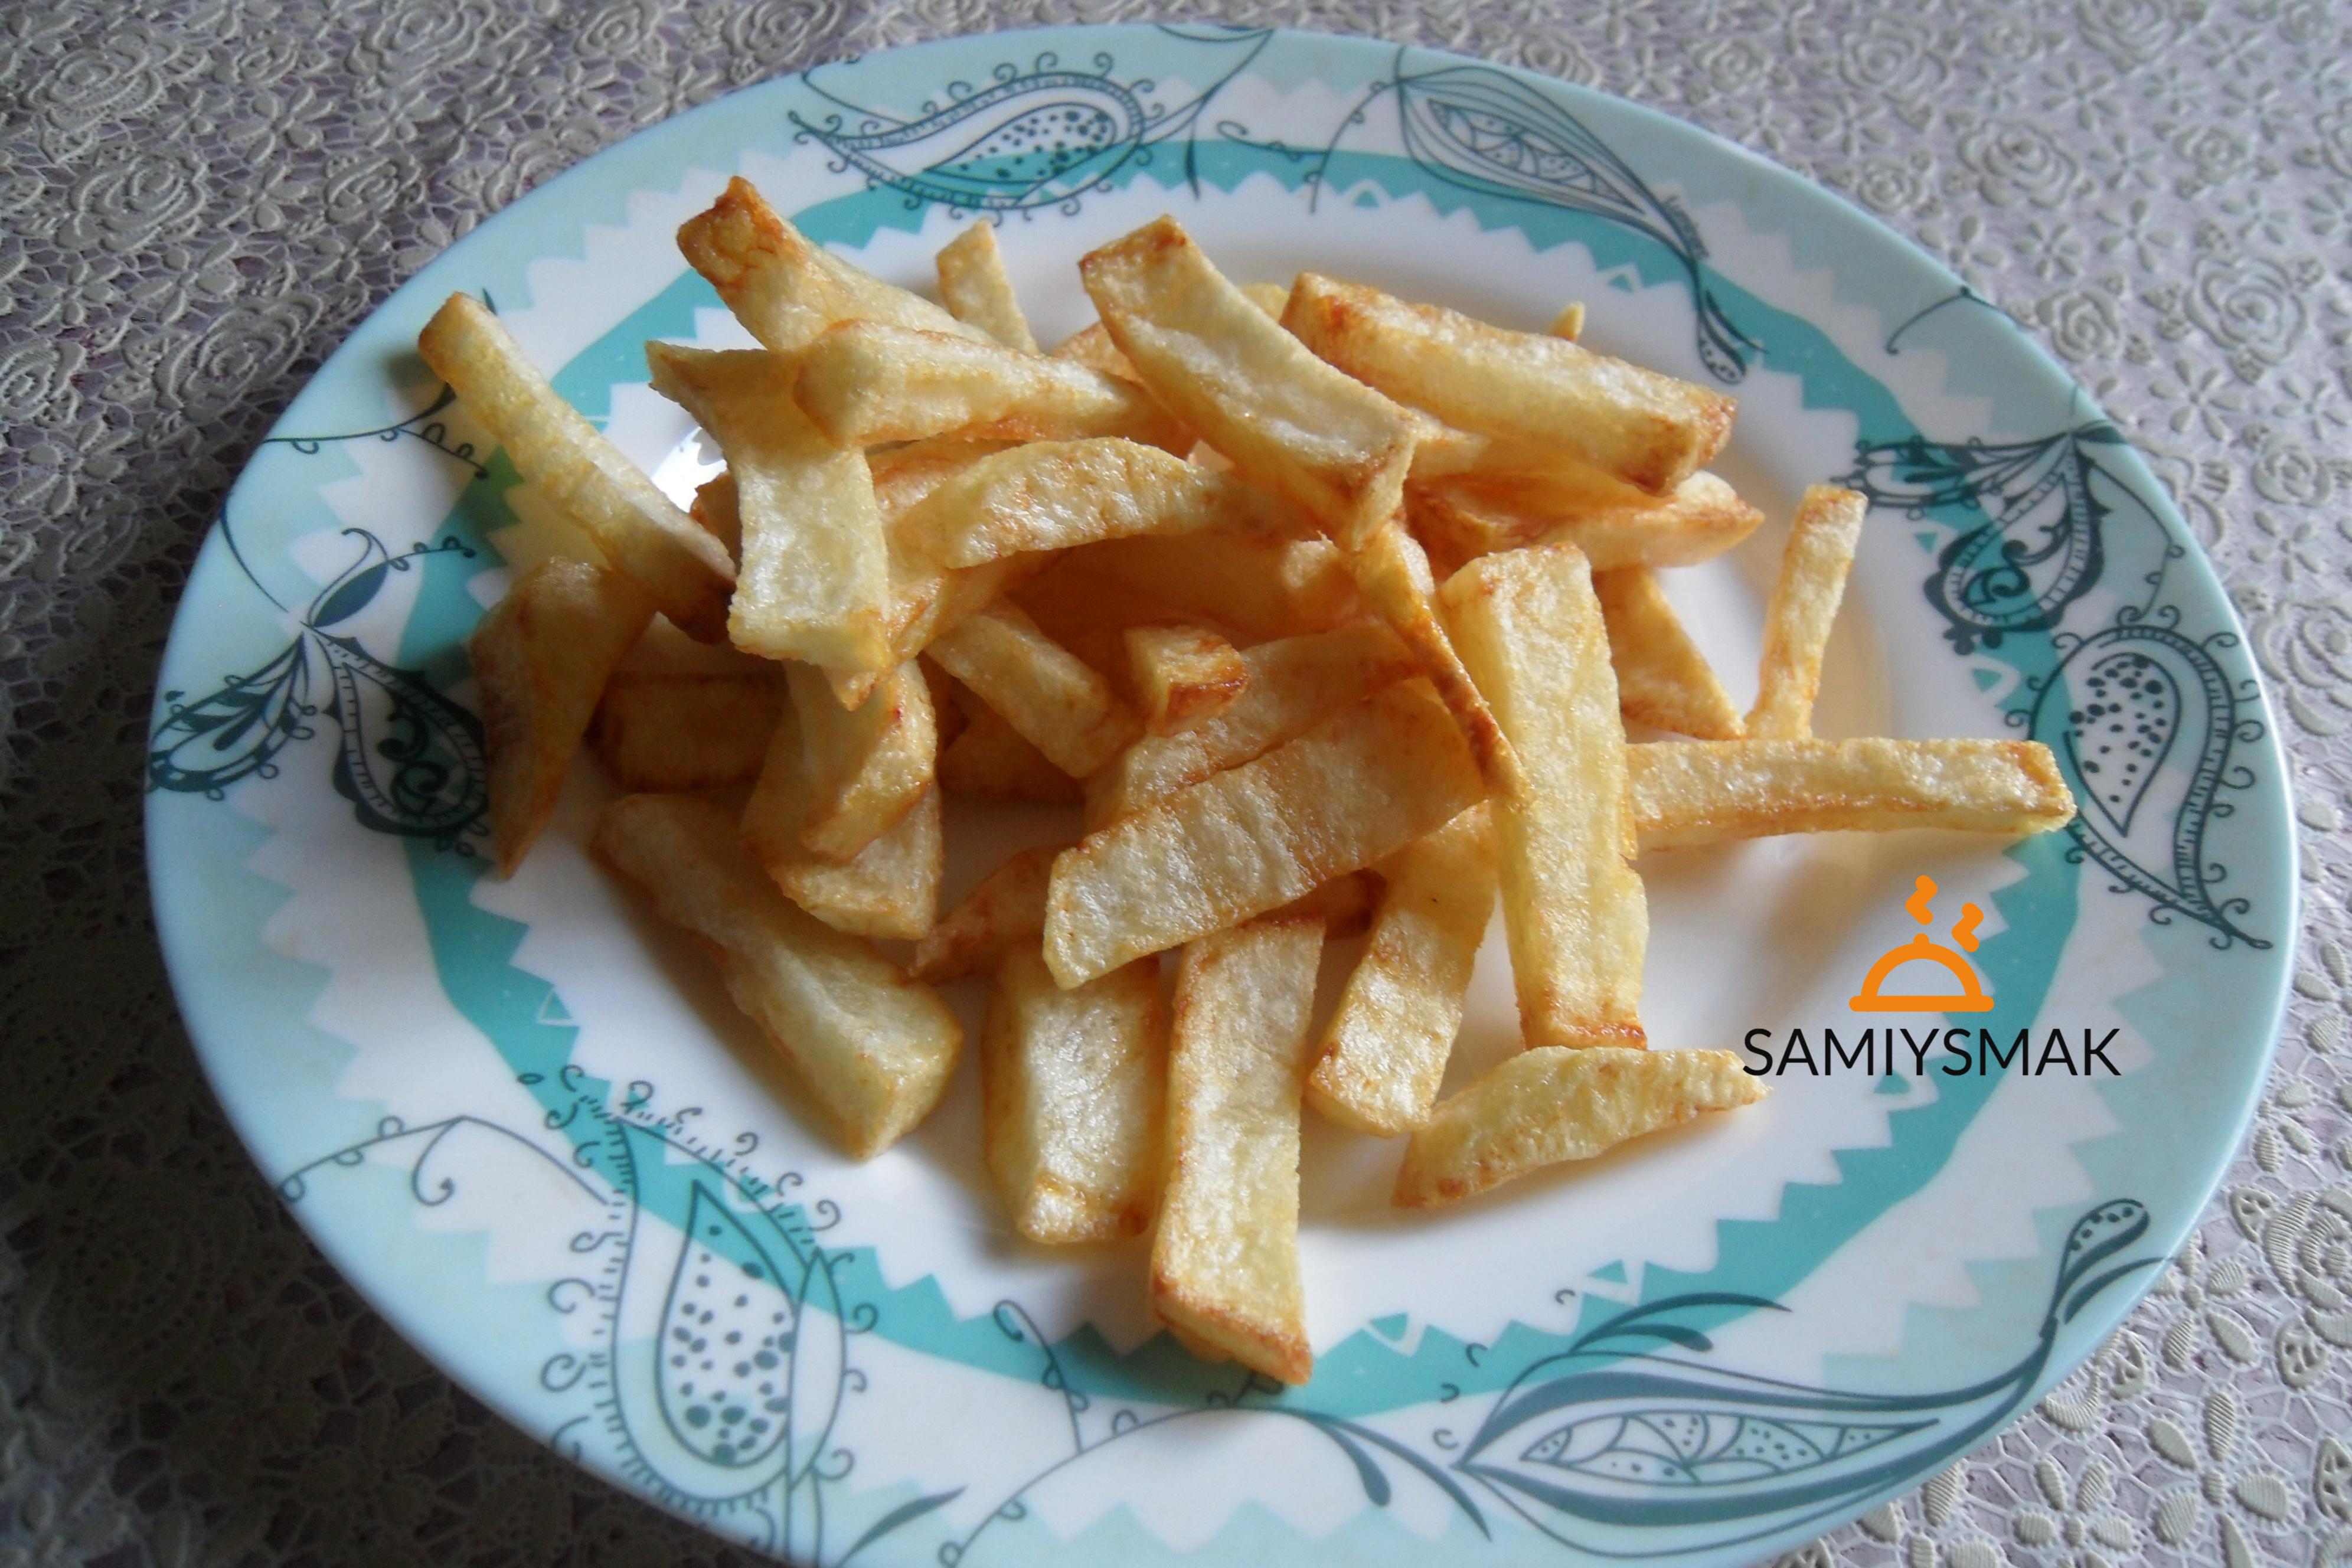 Картошка фри домашняя по рецепту